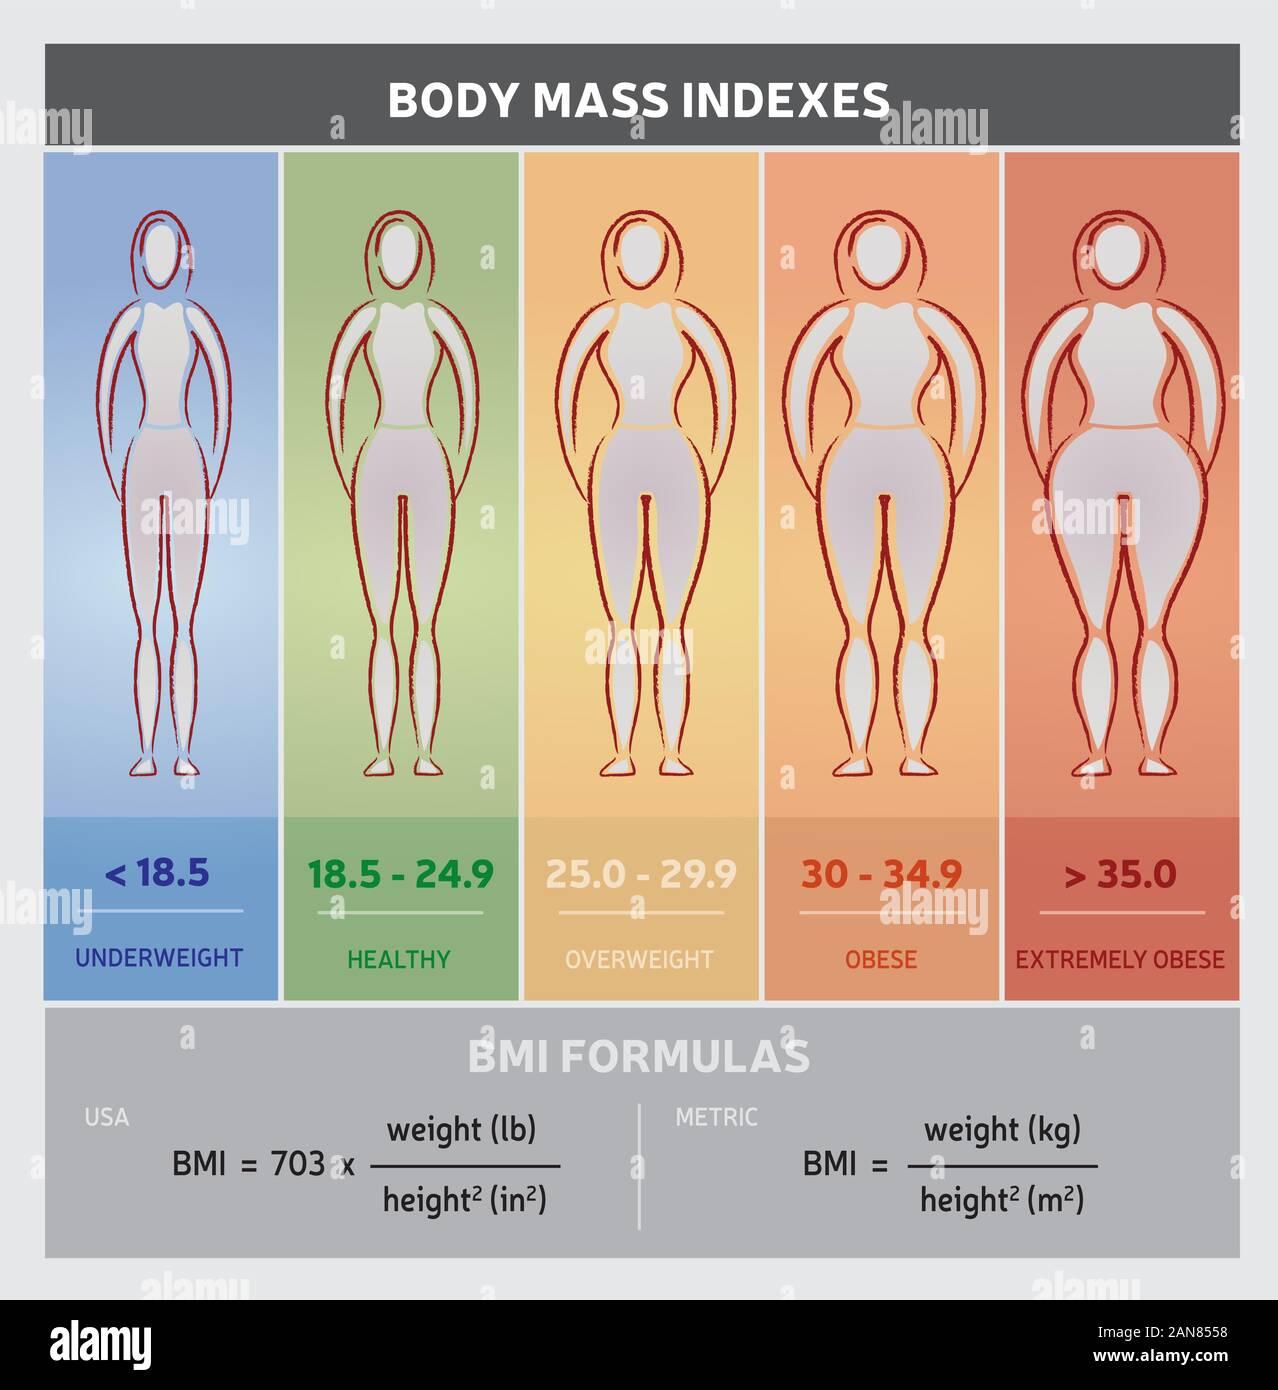 Pictures bmi 22 female BMI FOR